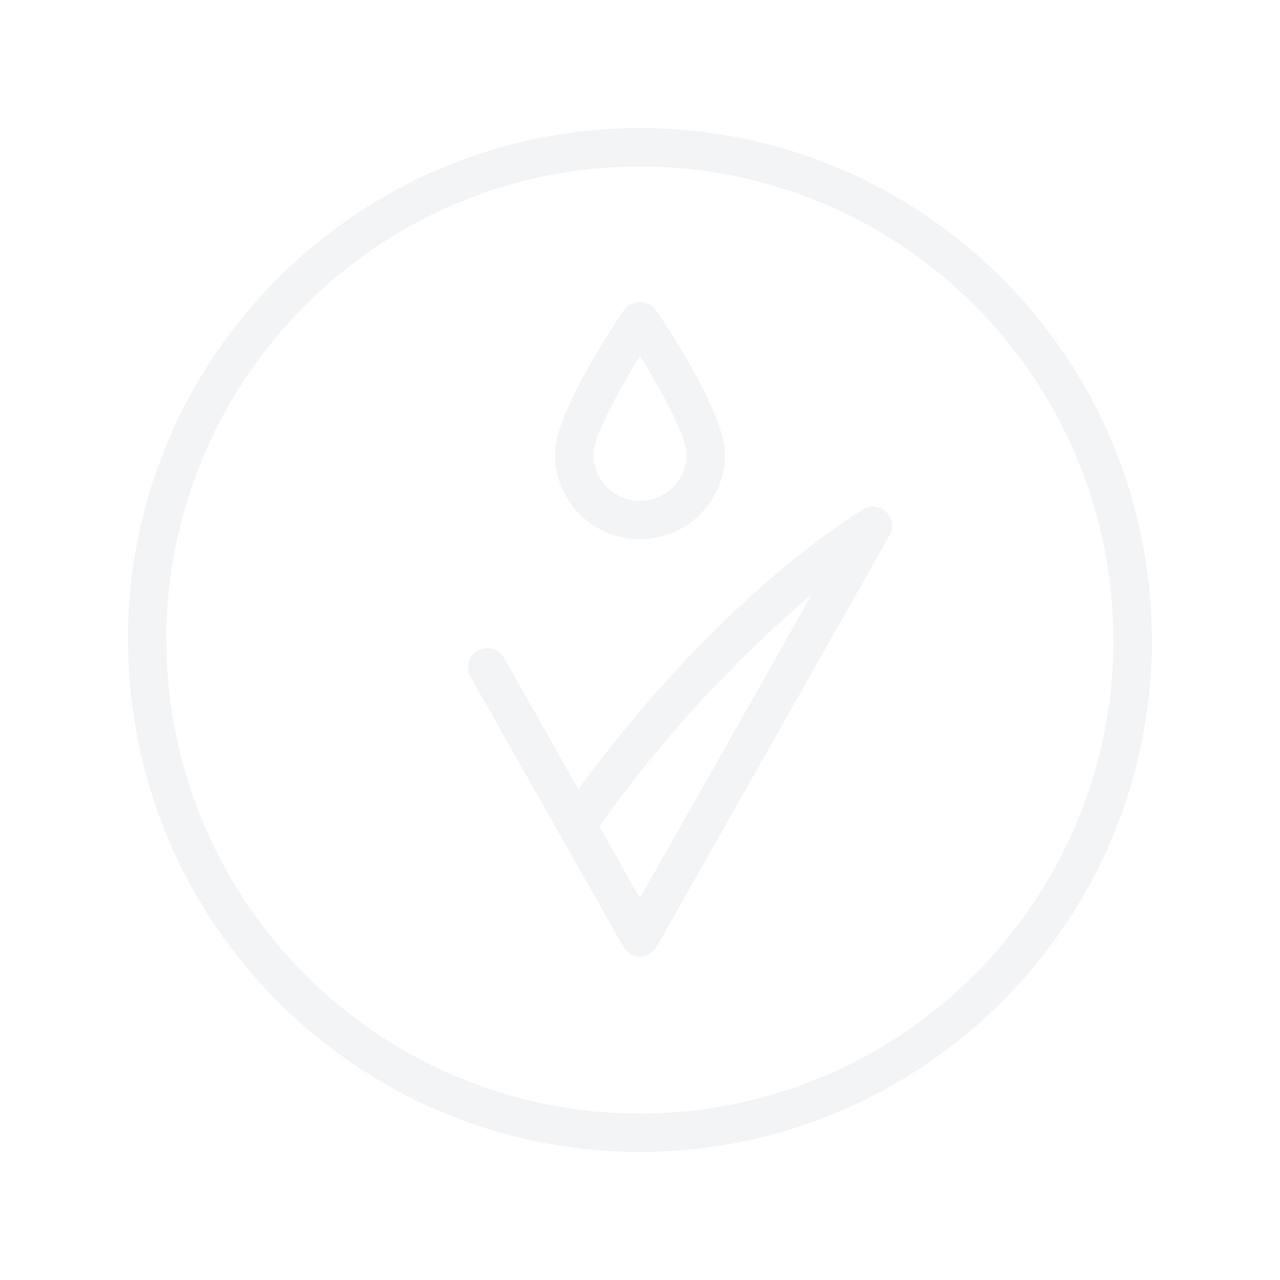 GOSH Metal Waterproof Eye Pencil водостойкий карандаш для глаз  1.2g